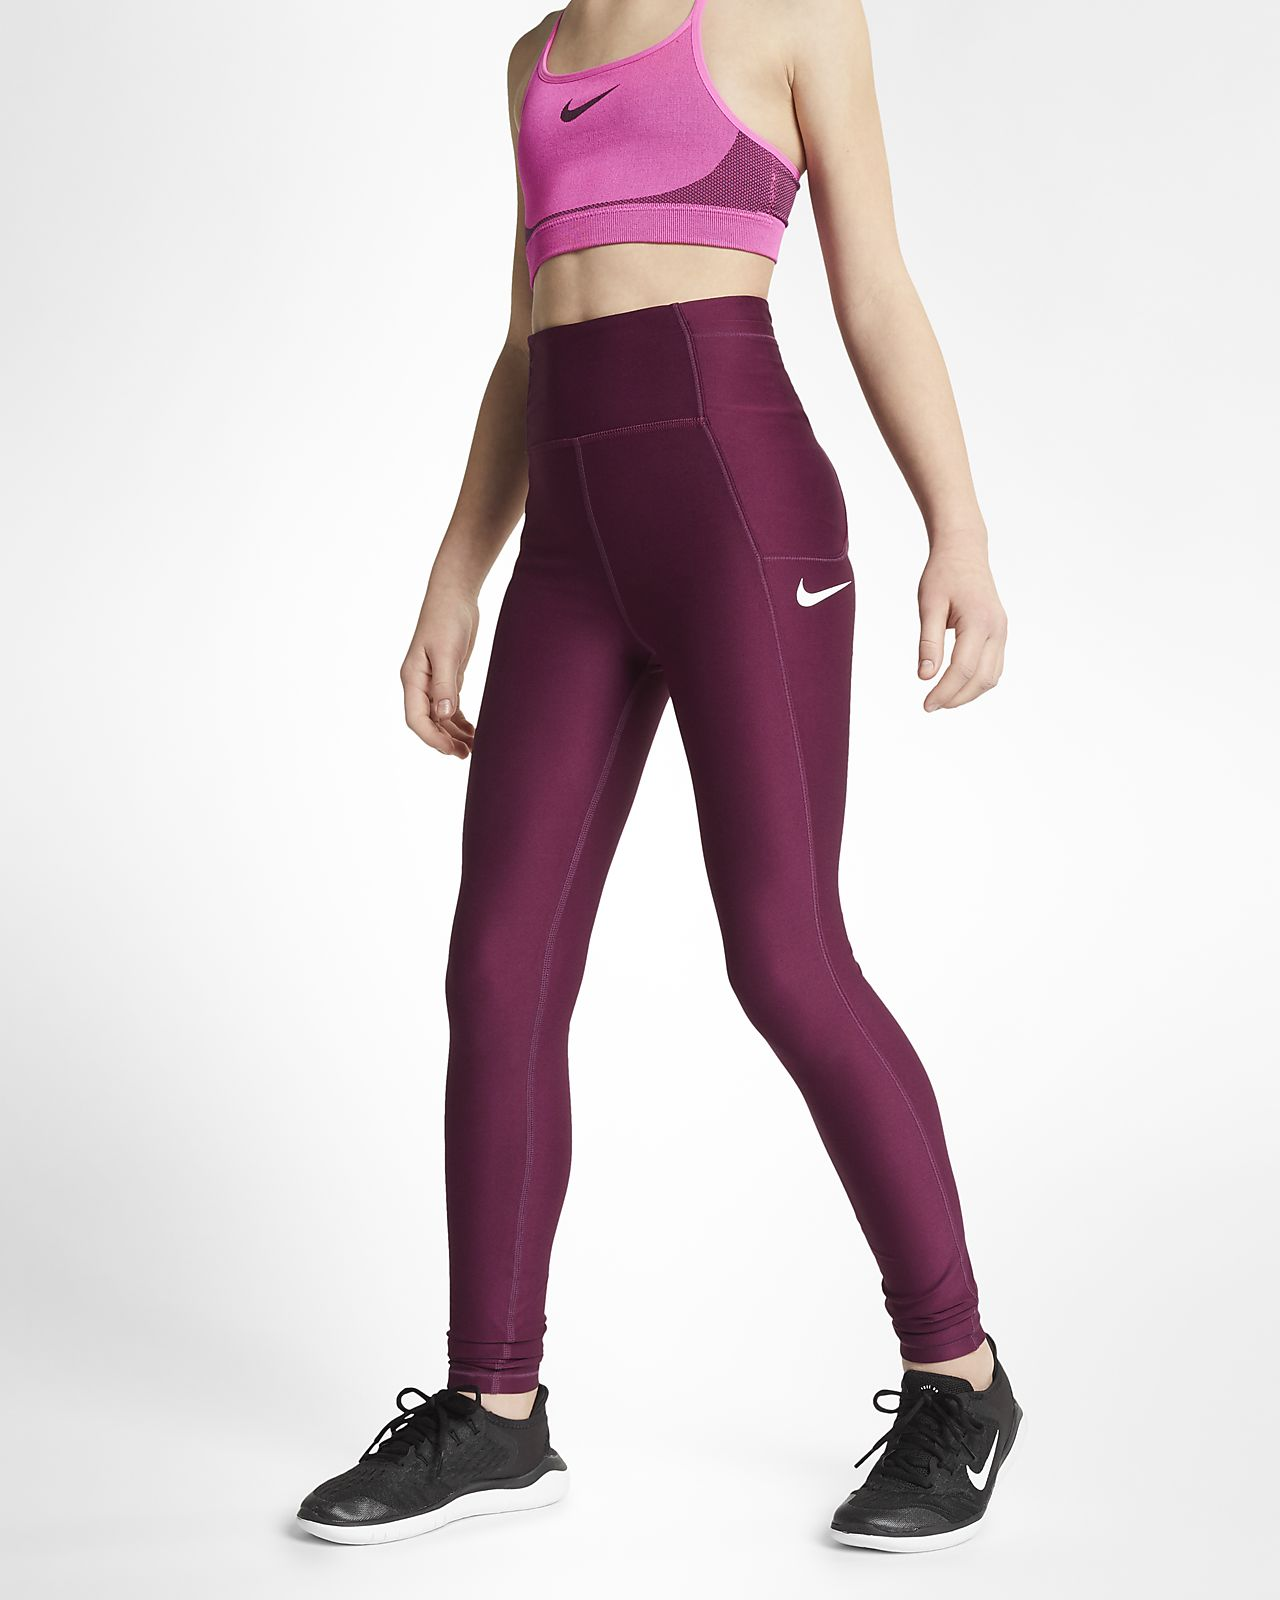 Nike Big Kids' (Girls') Training Tights